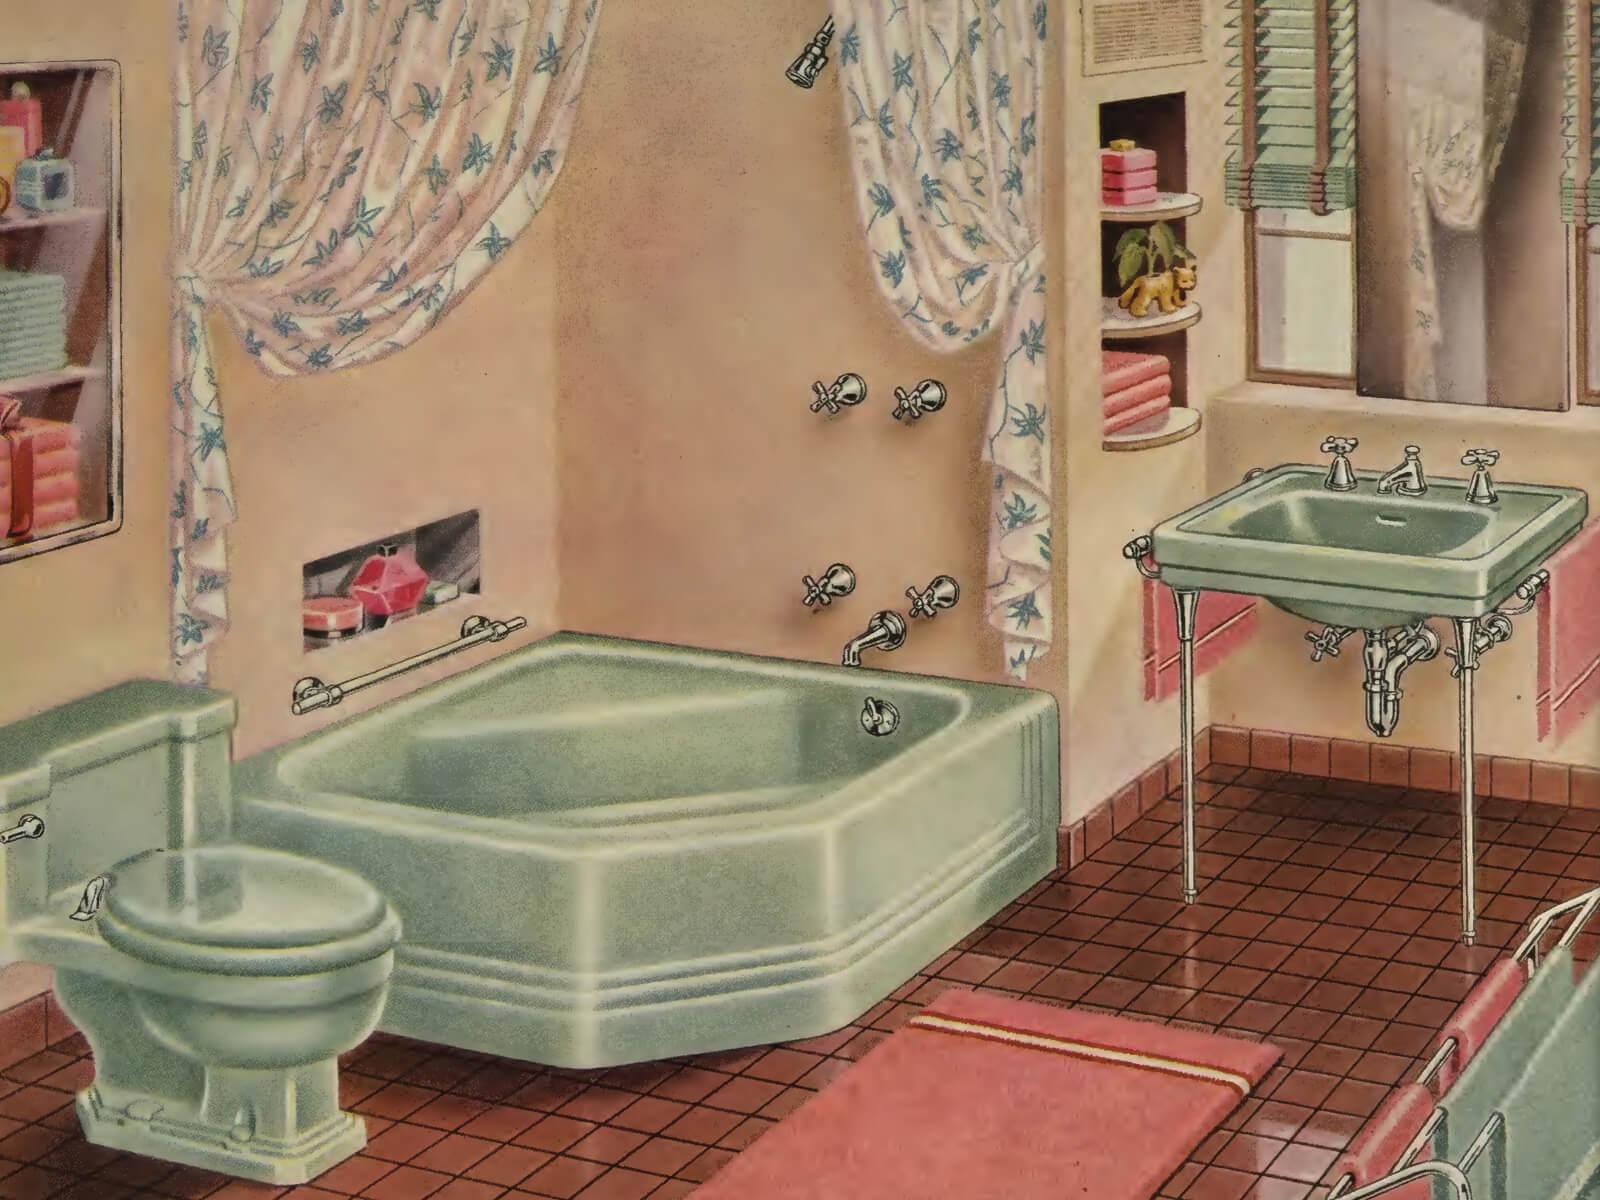 Victorian Bathroom: A Quick History Of The Bathroom